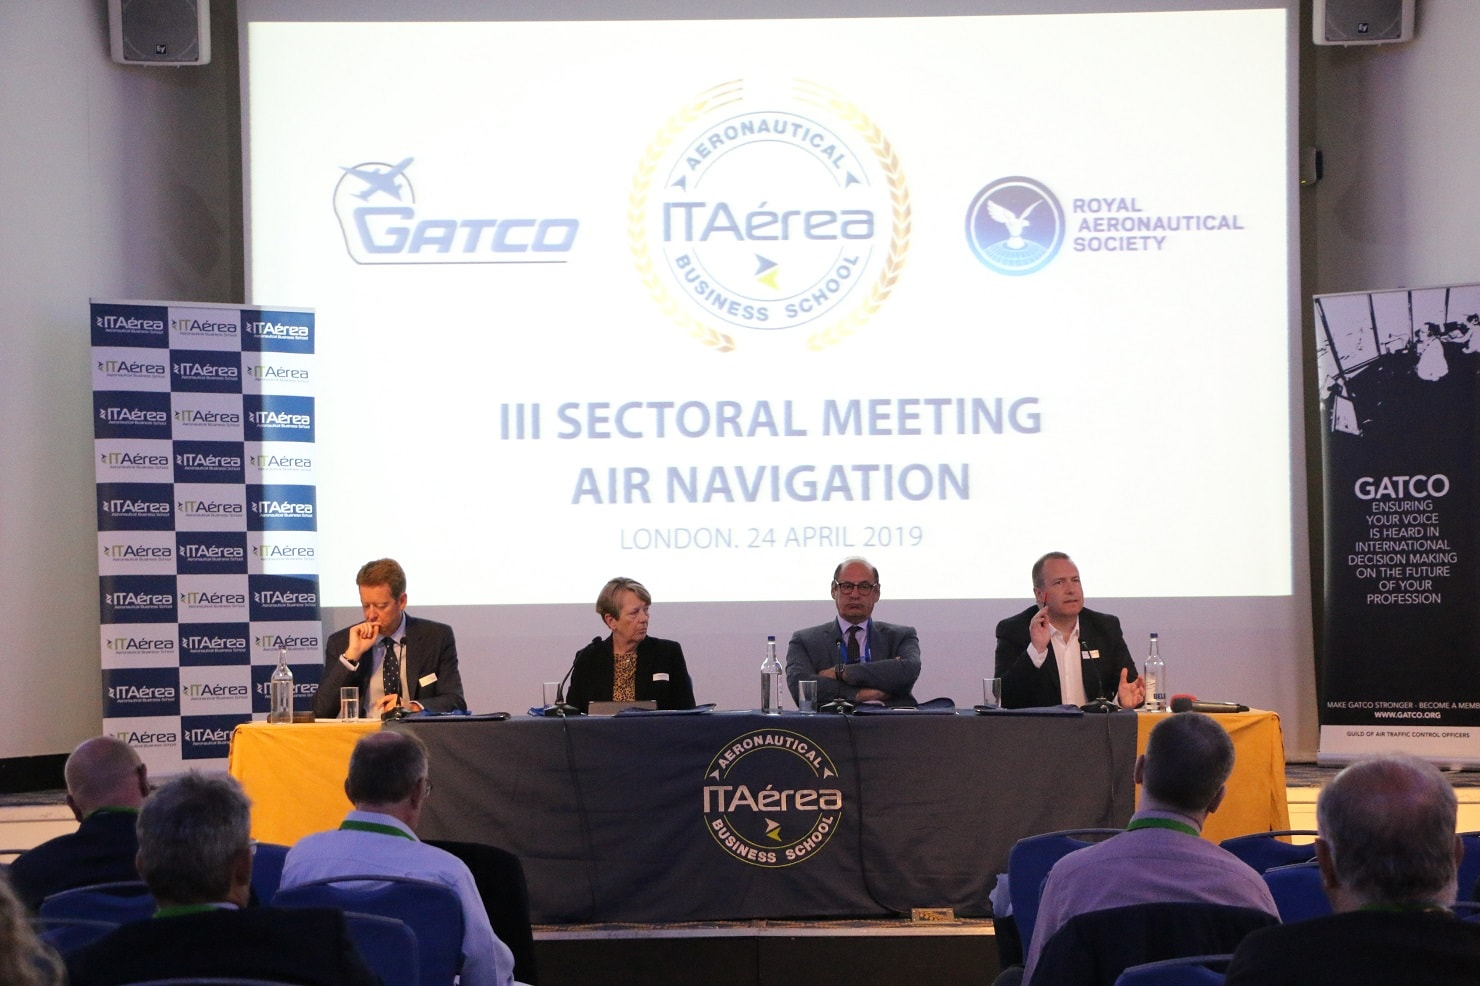 5 min - III Sector Meeting: Air Navigation